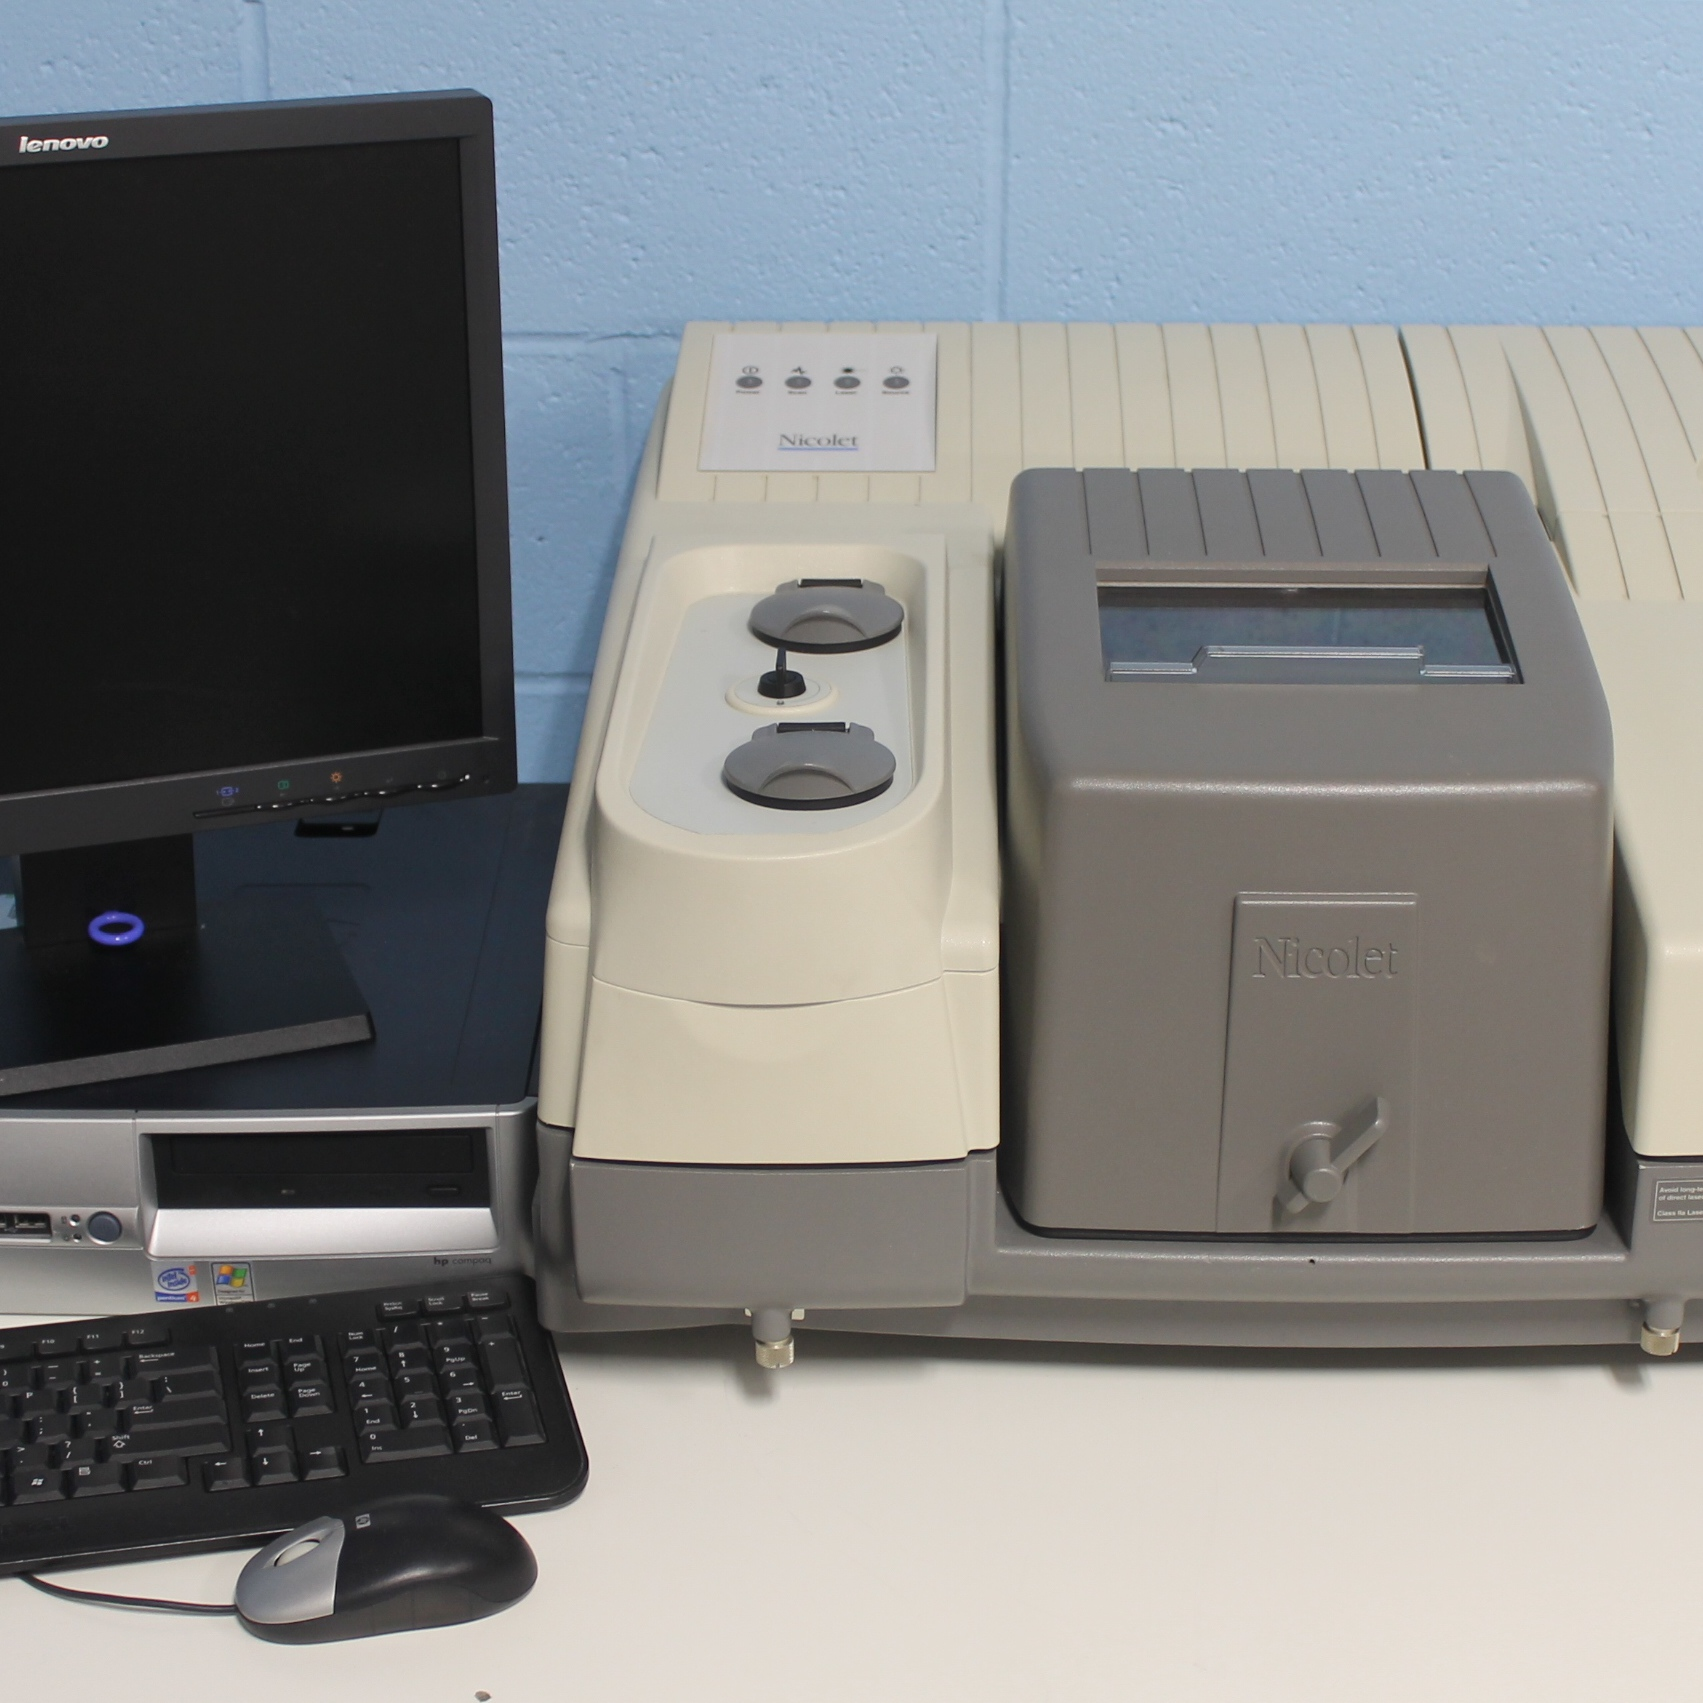 Nicolet NEXUS 670 FT-IR Spectrometer Name